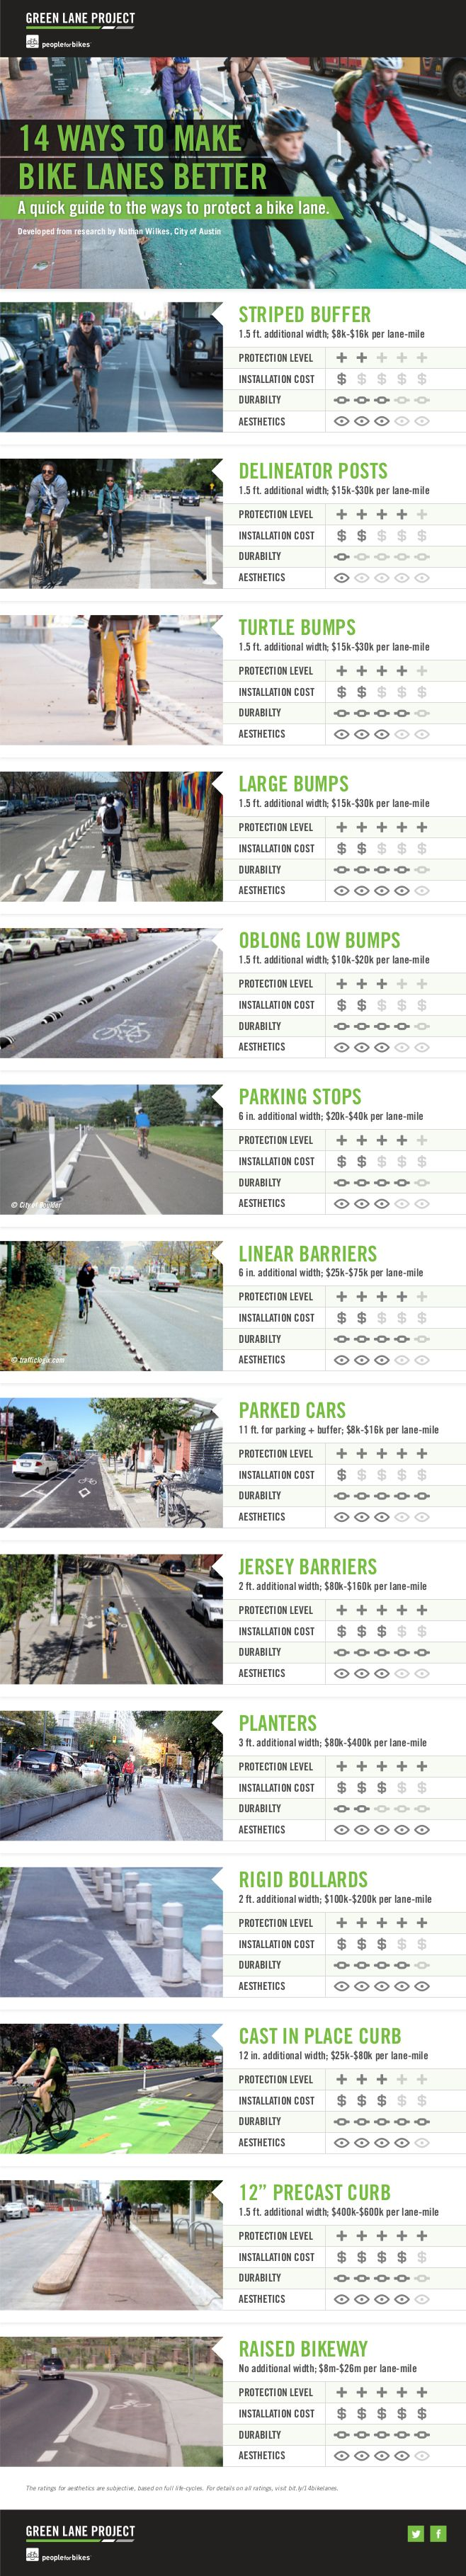 Various bike lane dividers compared, via @peopleforbikes. Streets for Everyone >> http://www.pinterest.com/slowottawa/